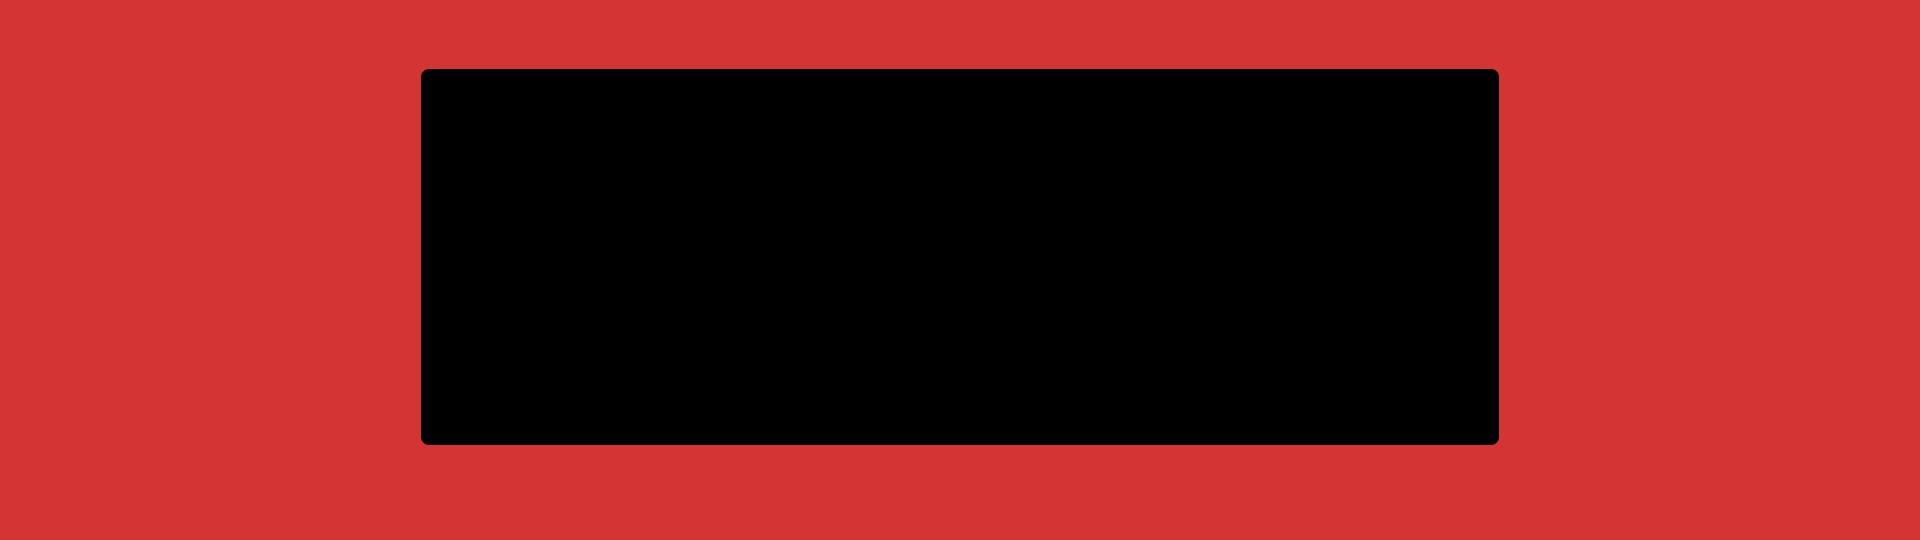 CATEGORY-SDA-ARZUMHAMARAT10INDIRIM-20-02